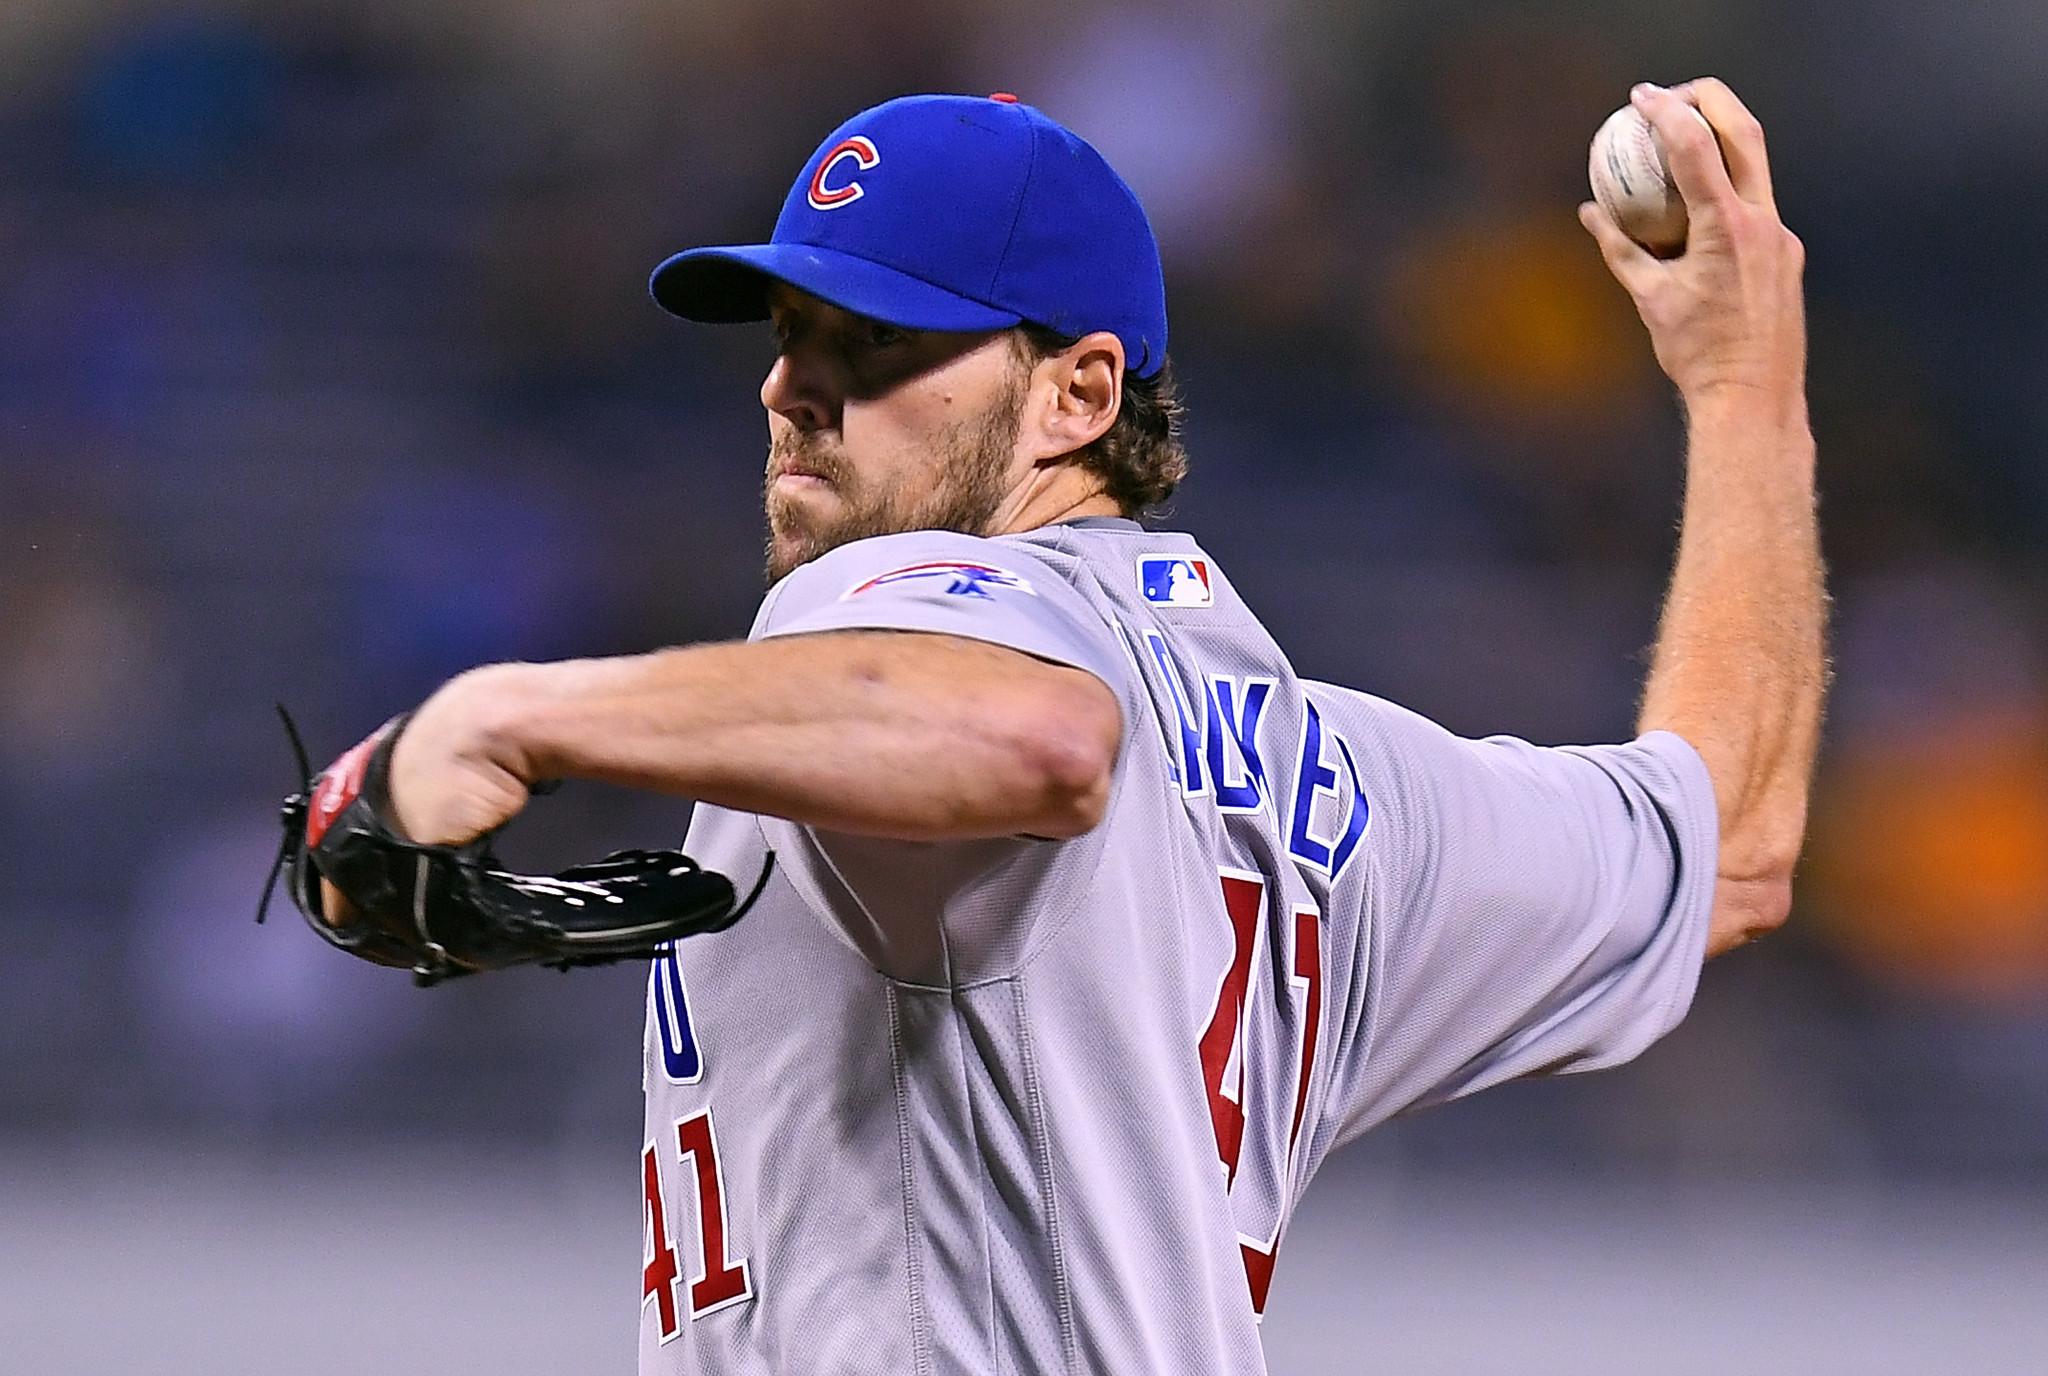 Cubs' John Lackey ready for more milestones - Chicago Tribune